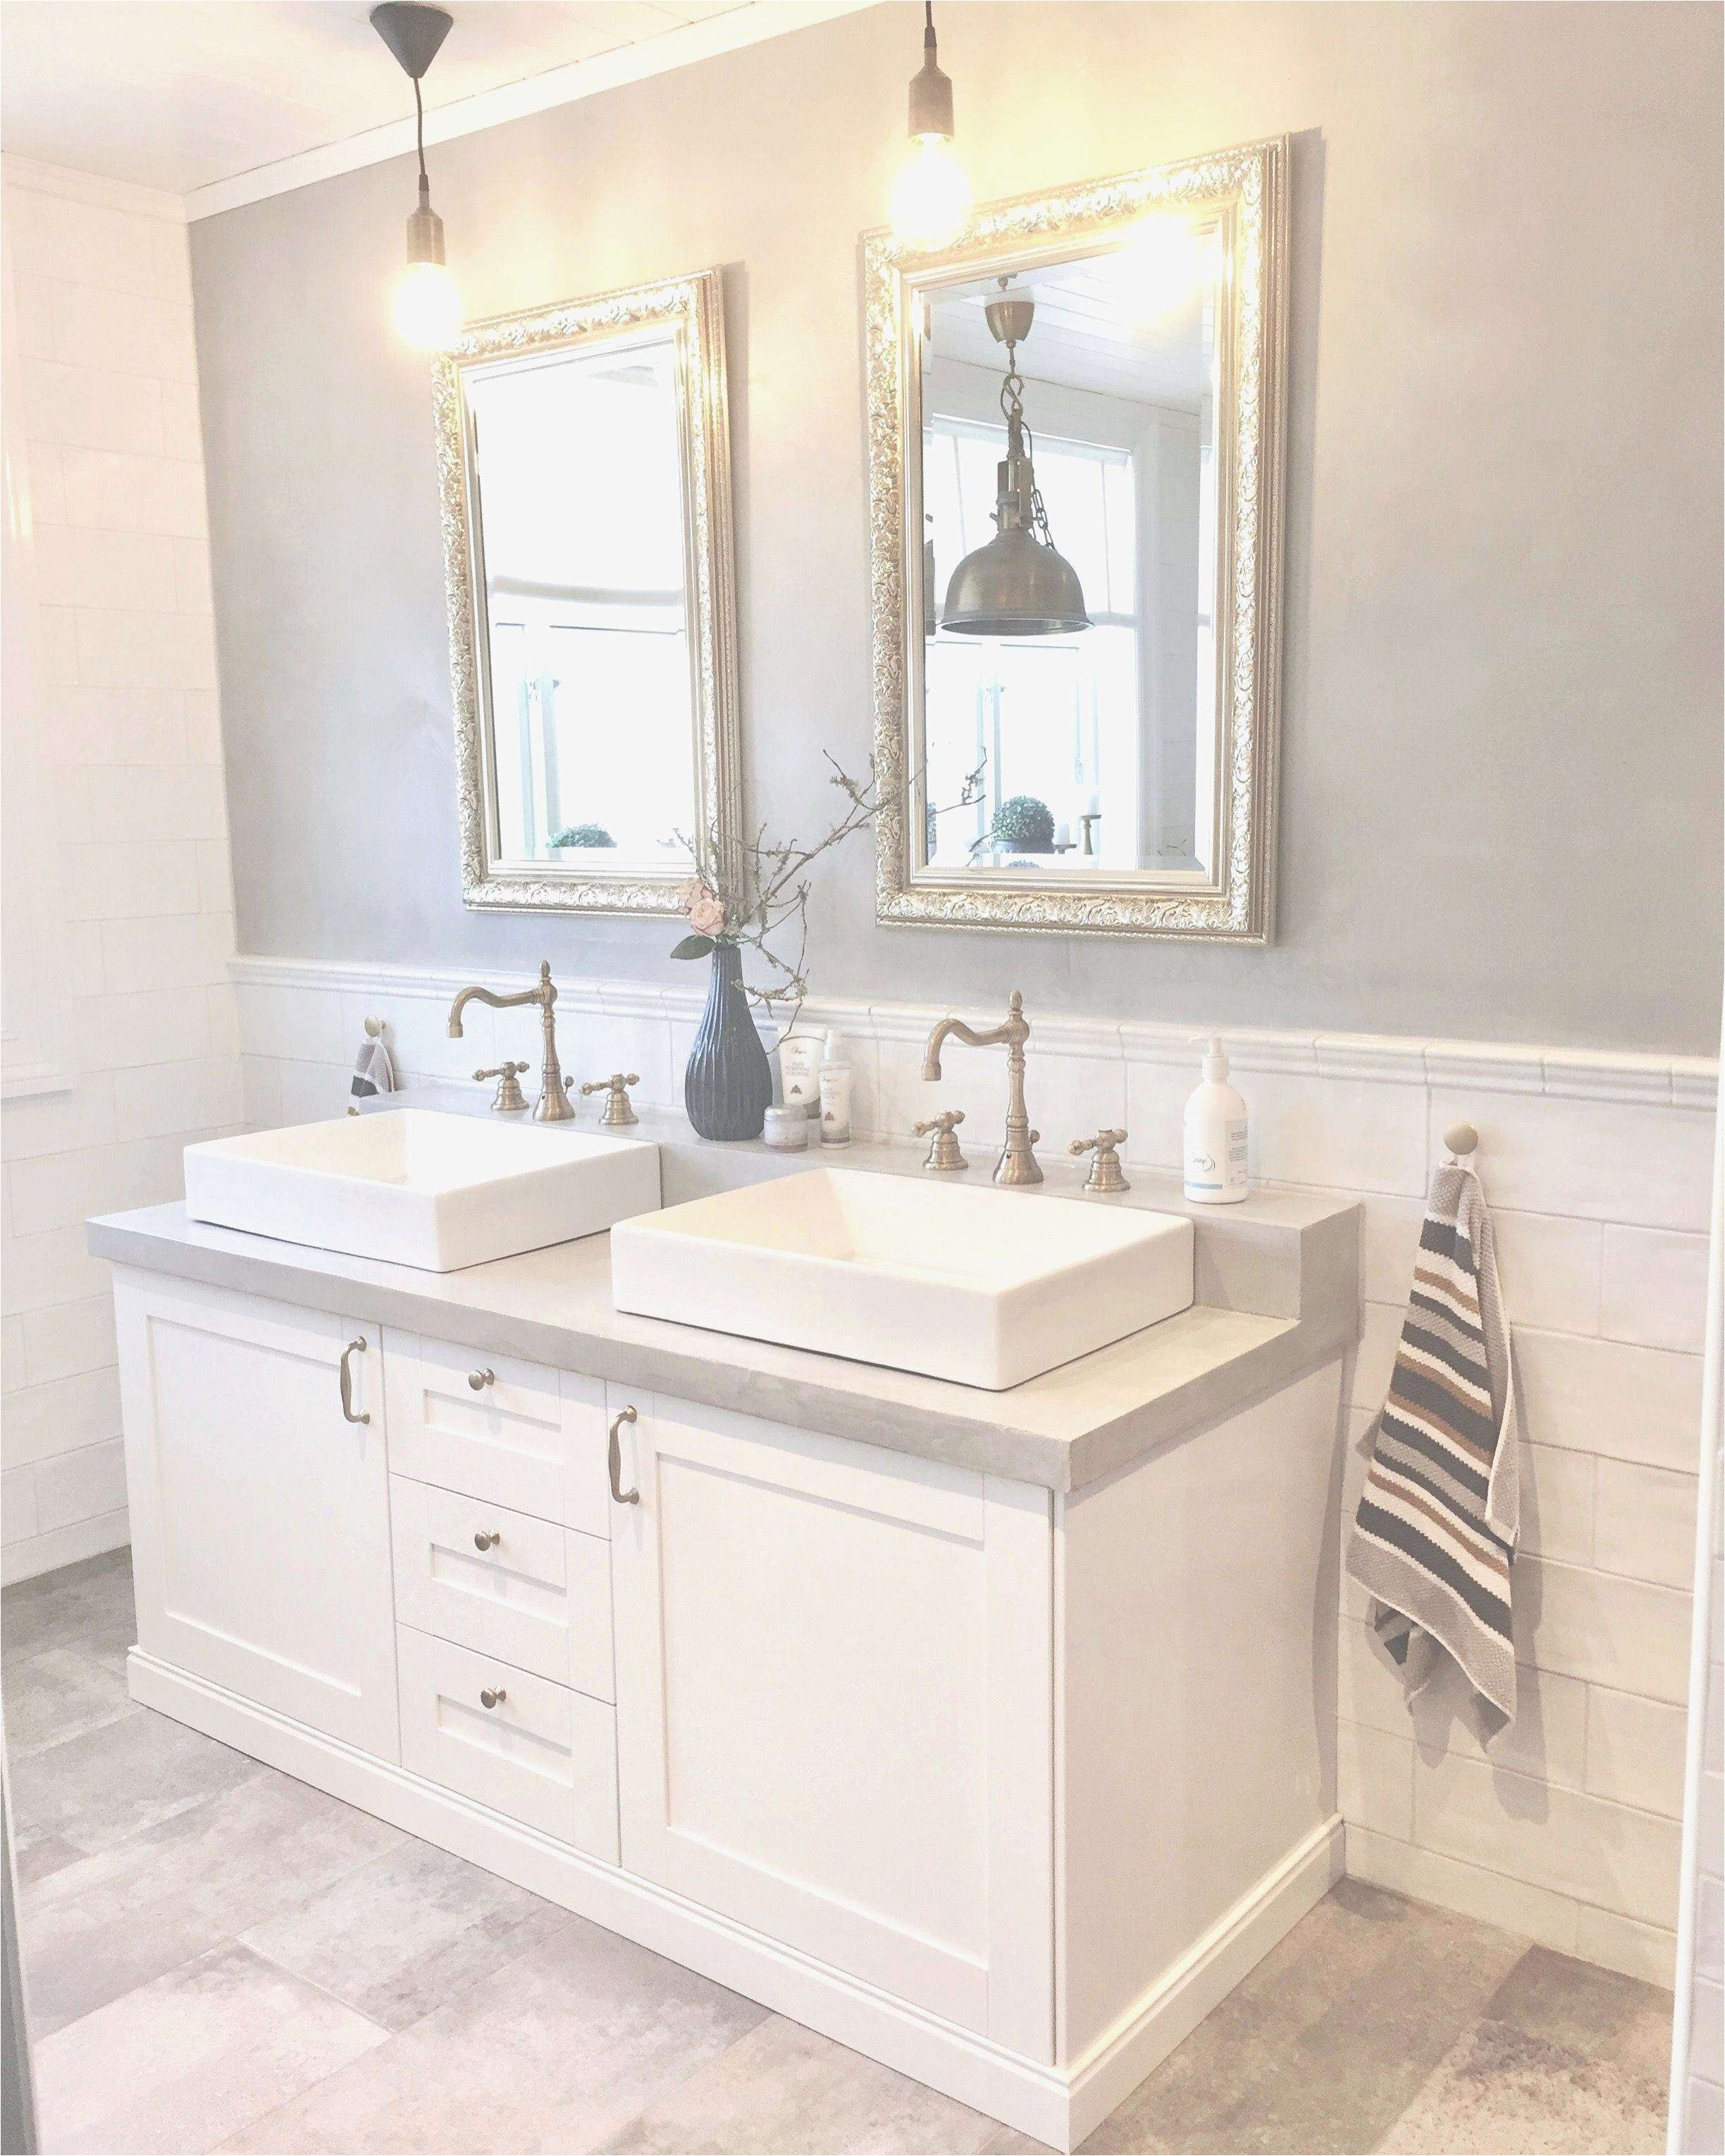 Bathroom Marble Design Ideas Accessories for Bathroom Shelves